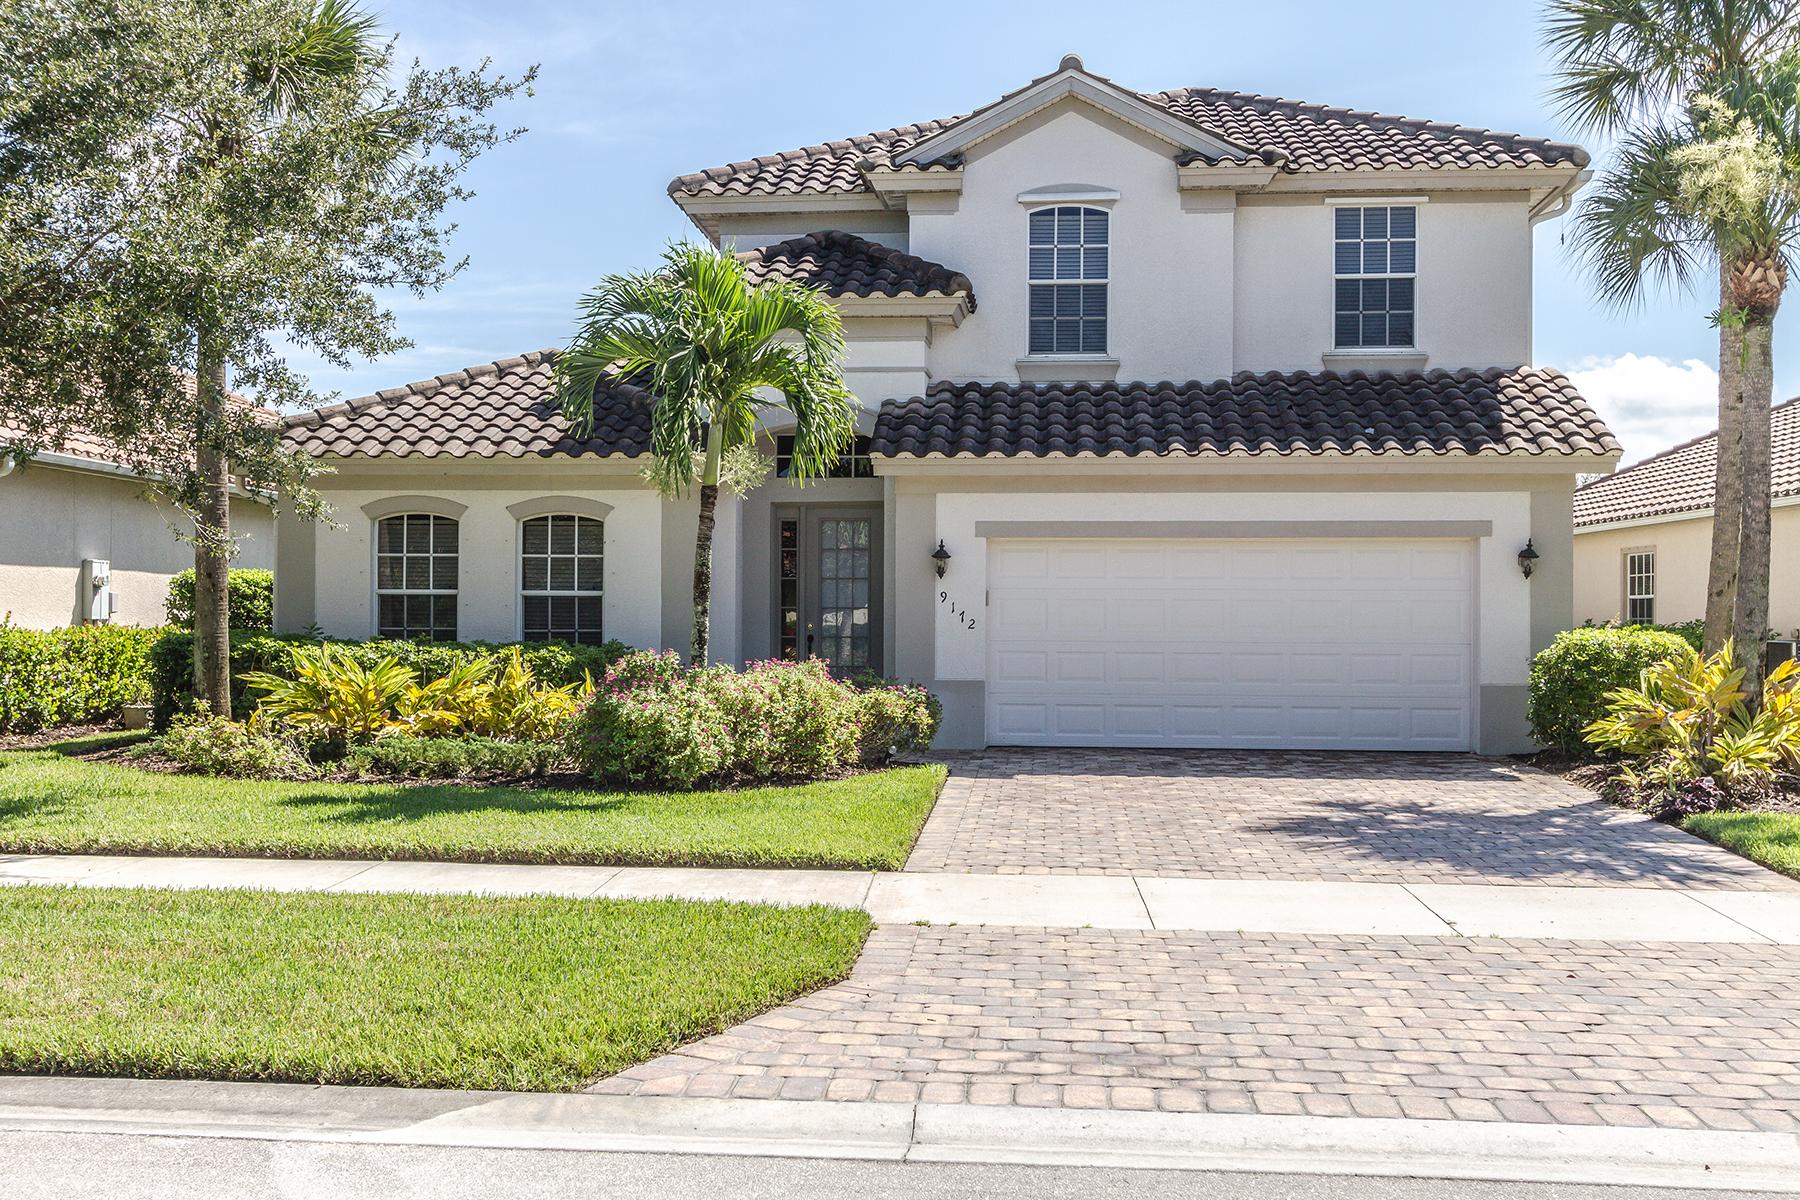 Casa Unifamiliar por un Venta en THE QUARRY - THE SHALLOWS 9172 Quartz Ln Naples, Florida, 34120 Estados Unidos